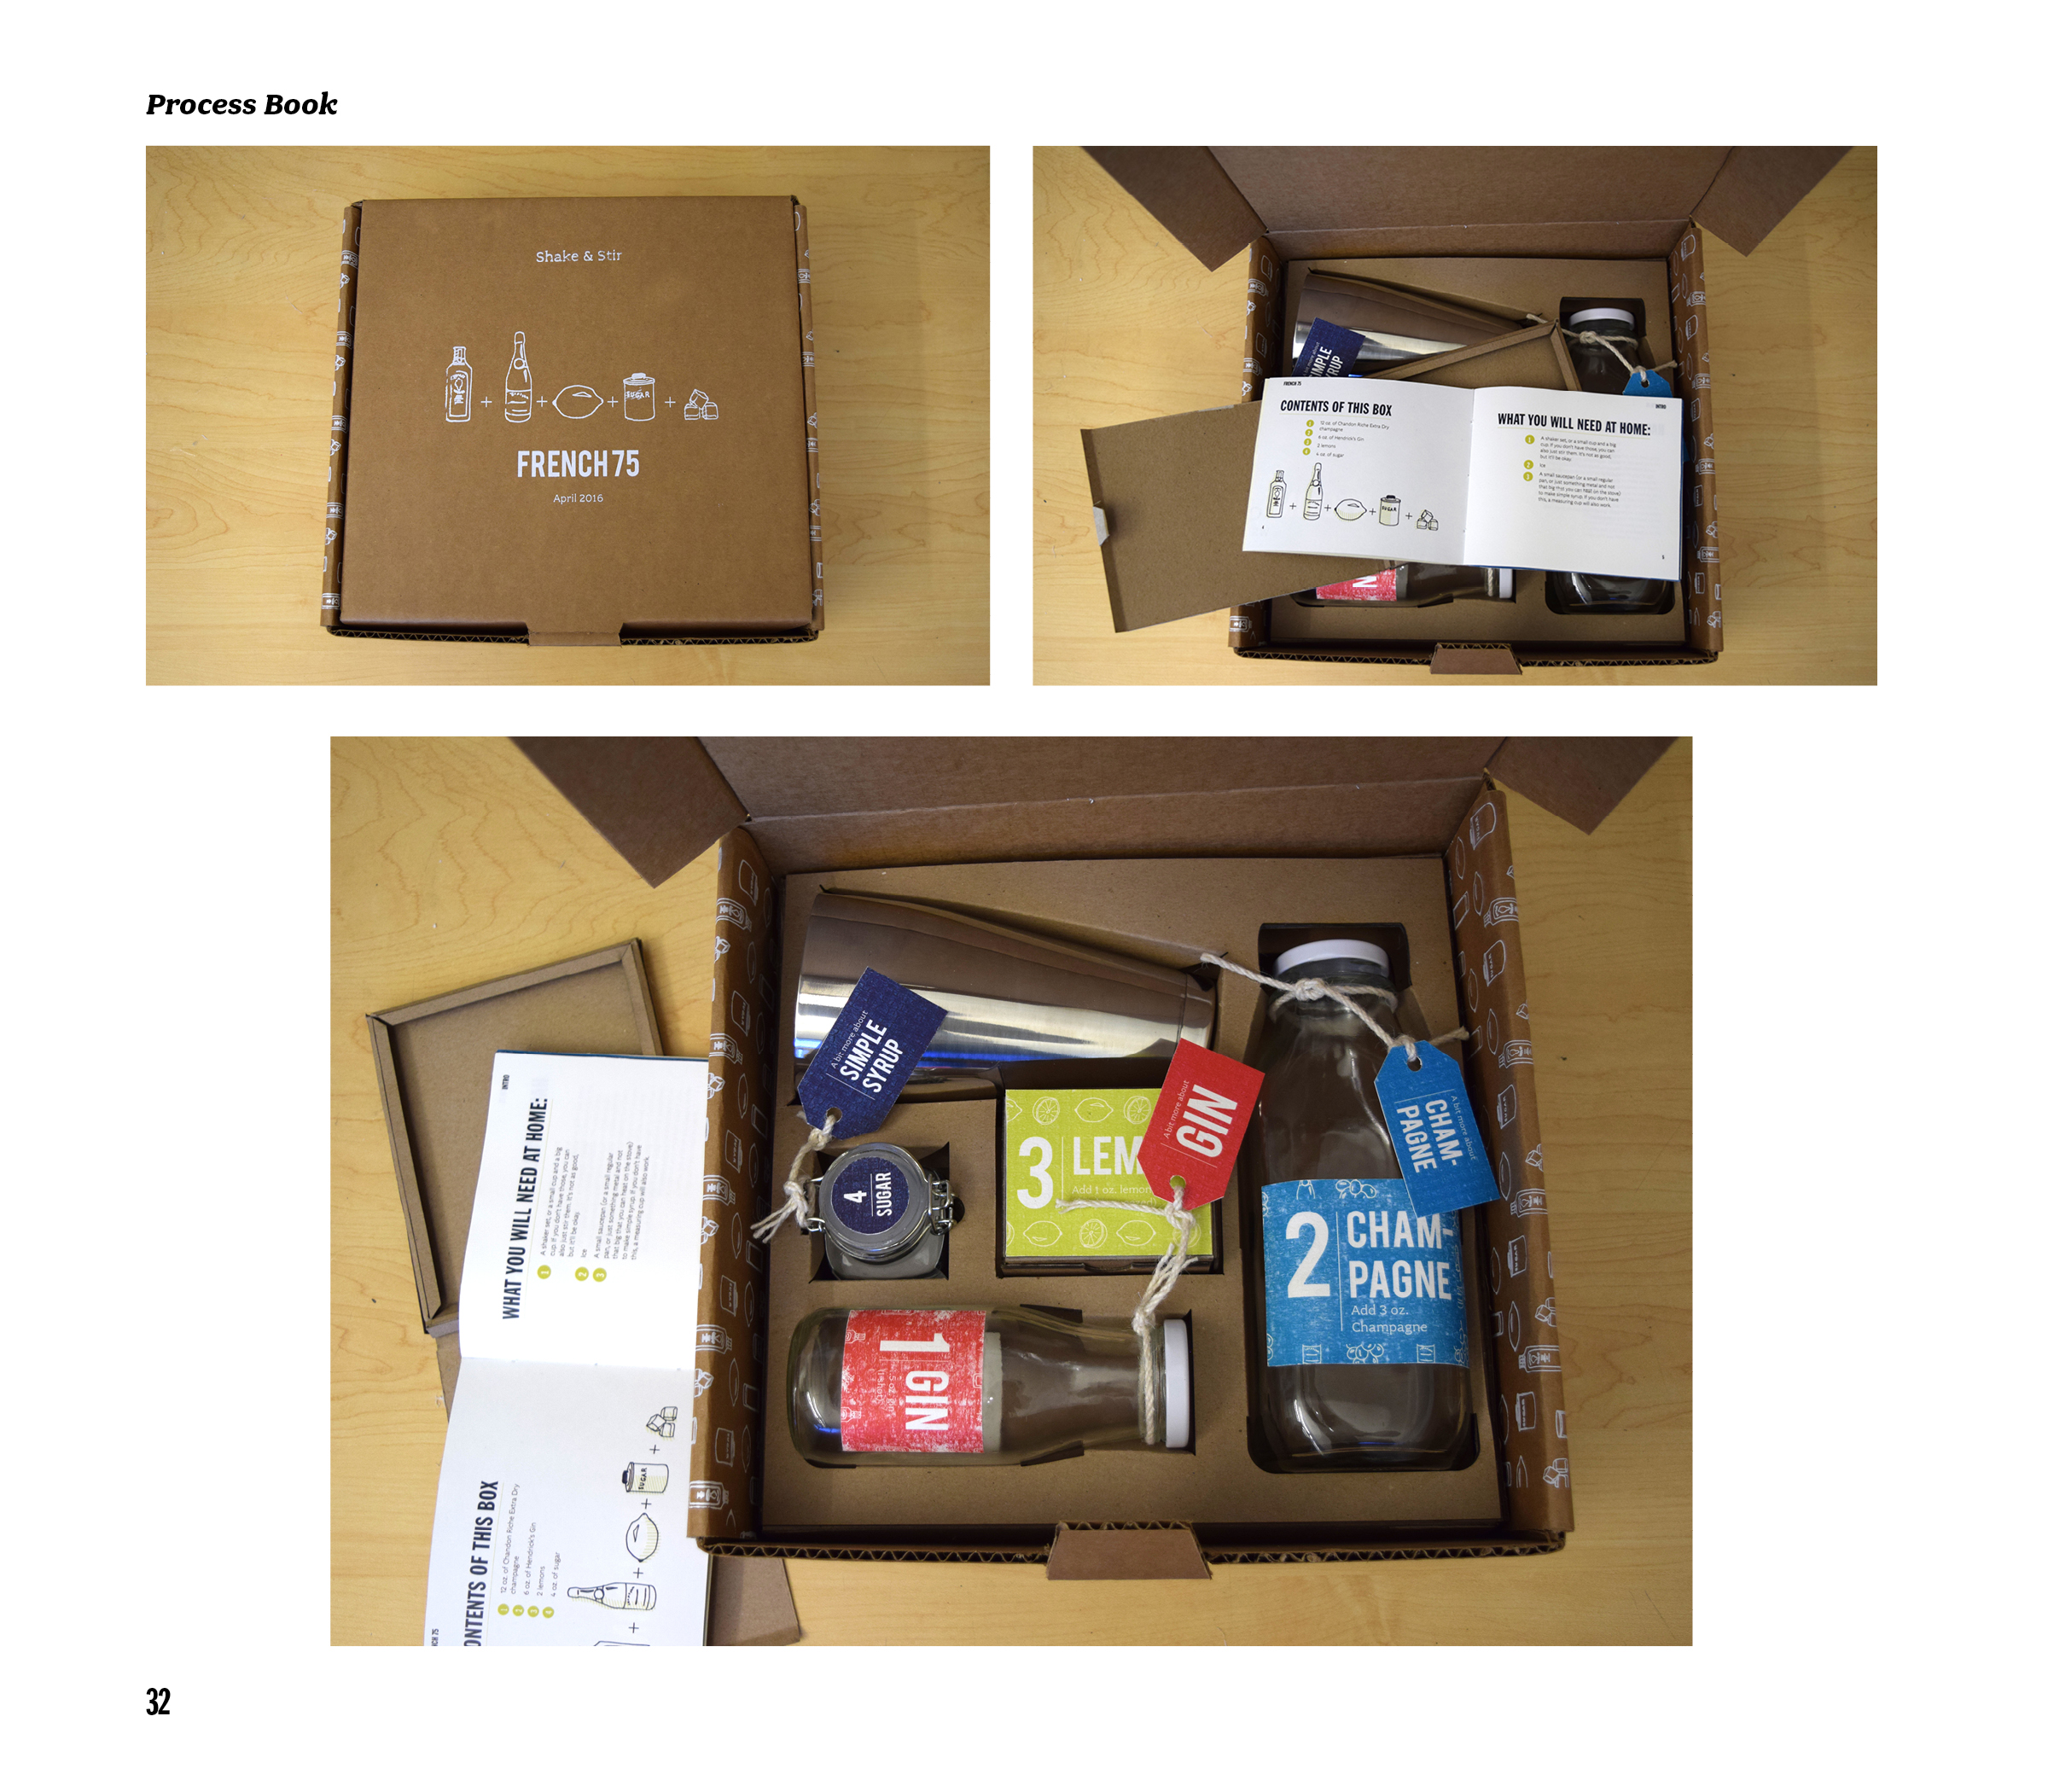 process book 232.jpg